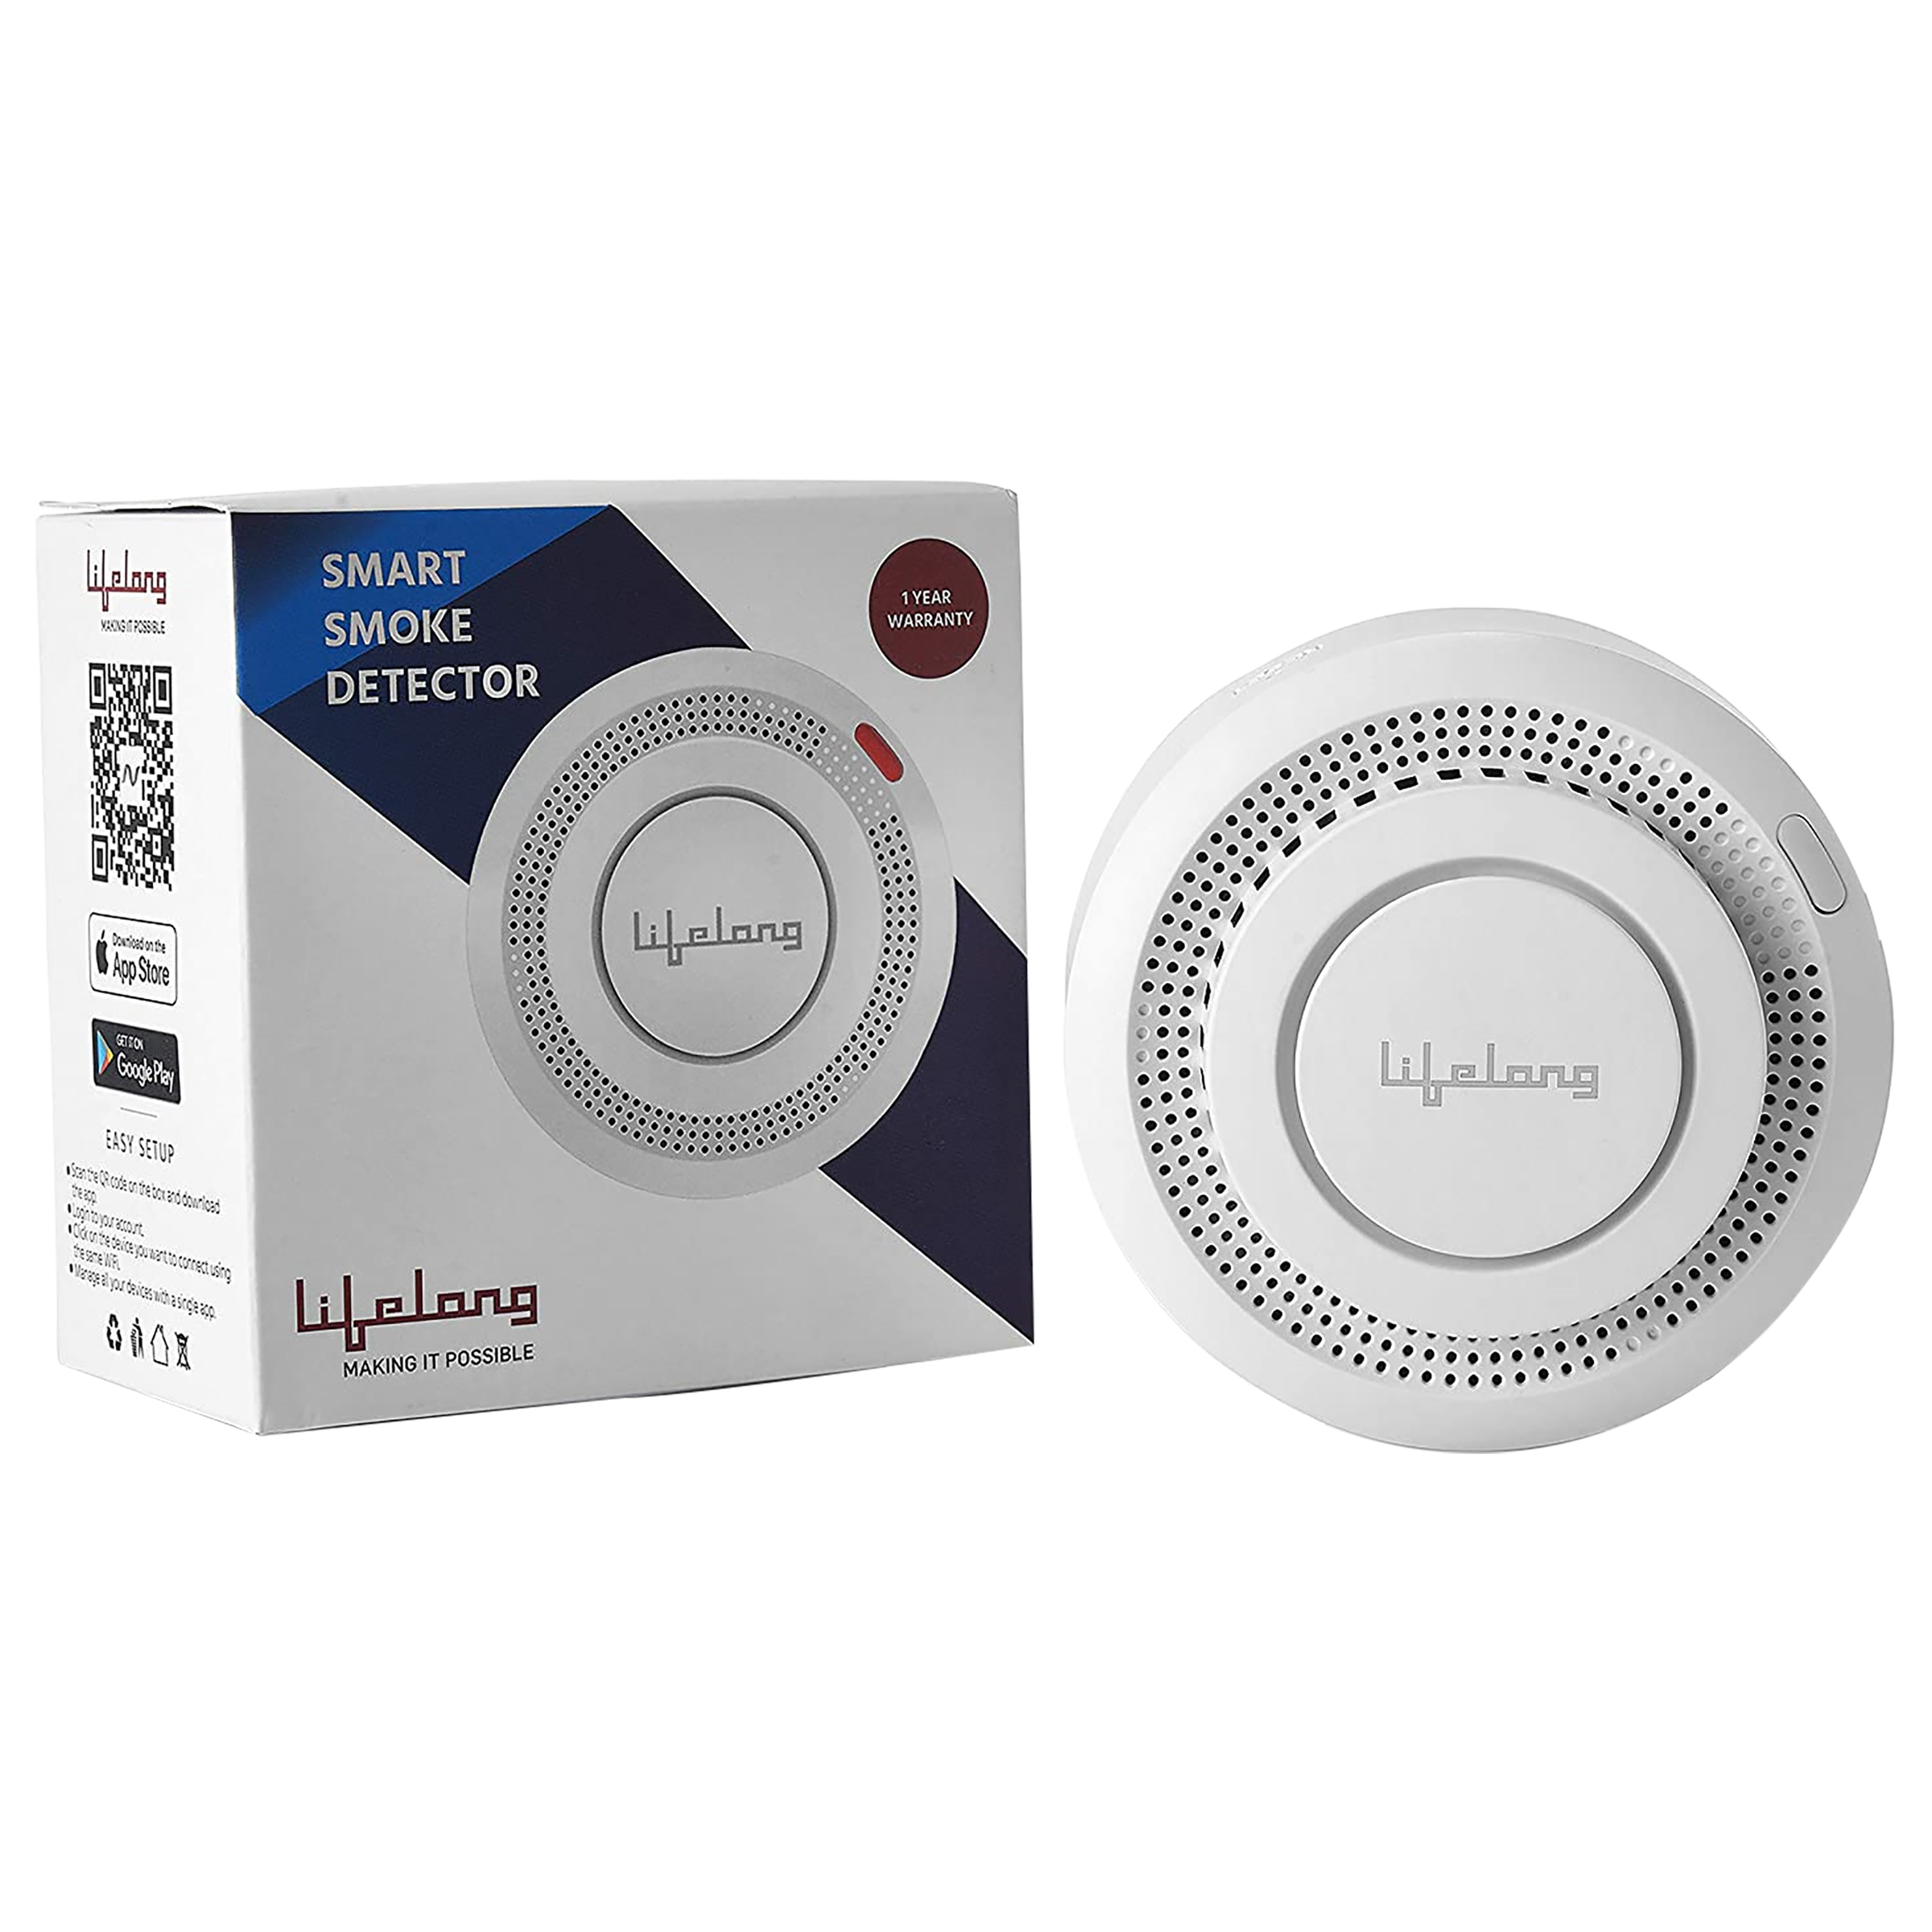 Lifelong Fire Alarm (70 dB, Lifelong Smart Home App, LLDS02, White)_1